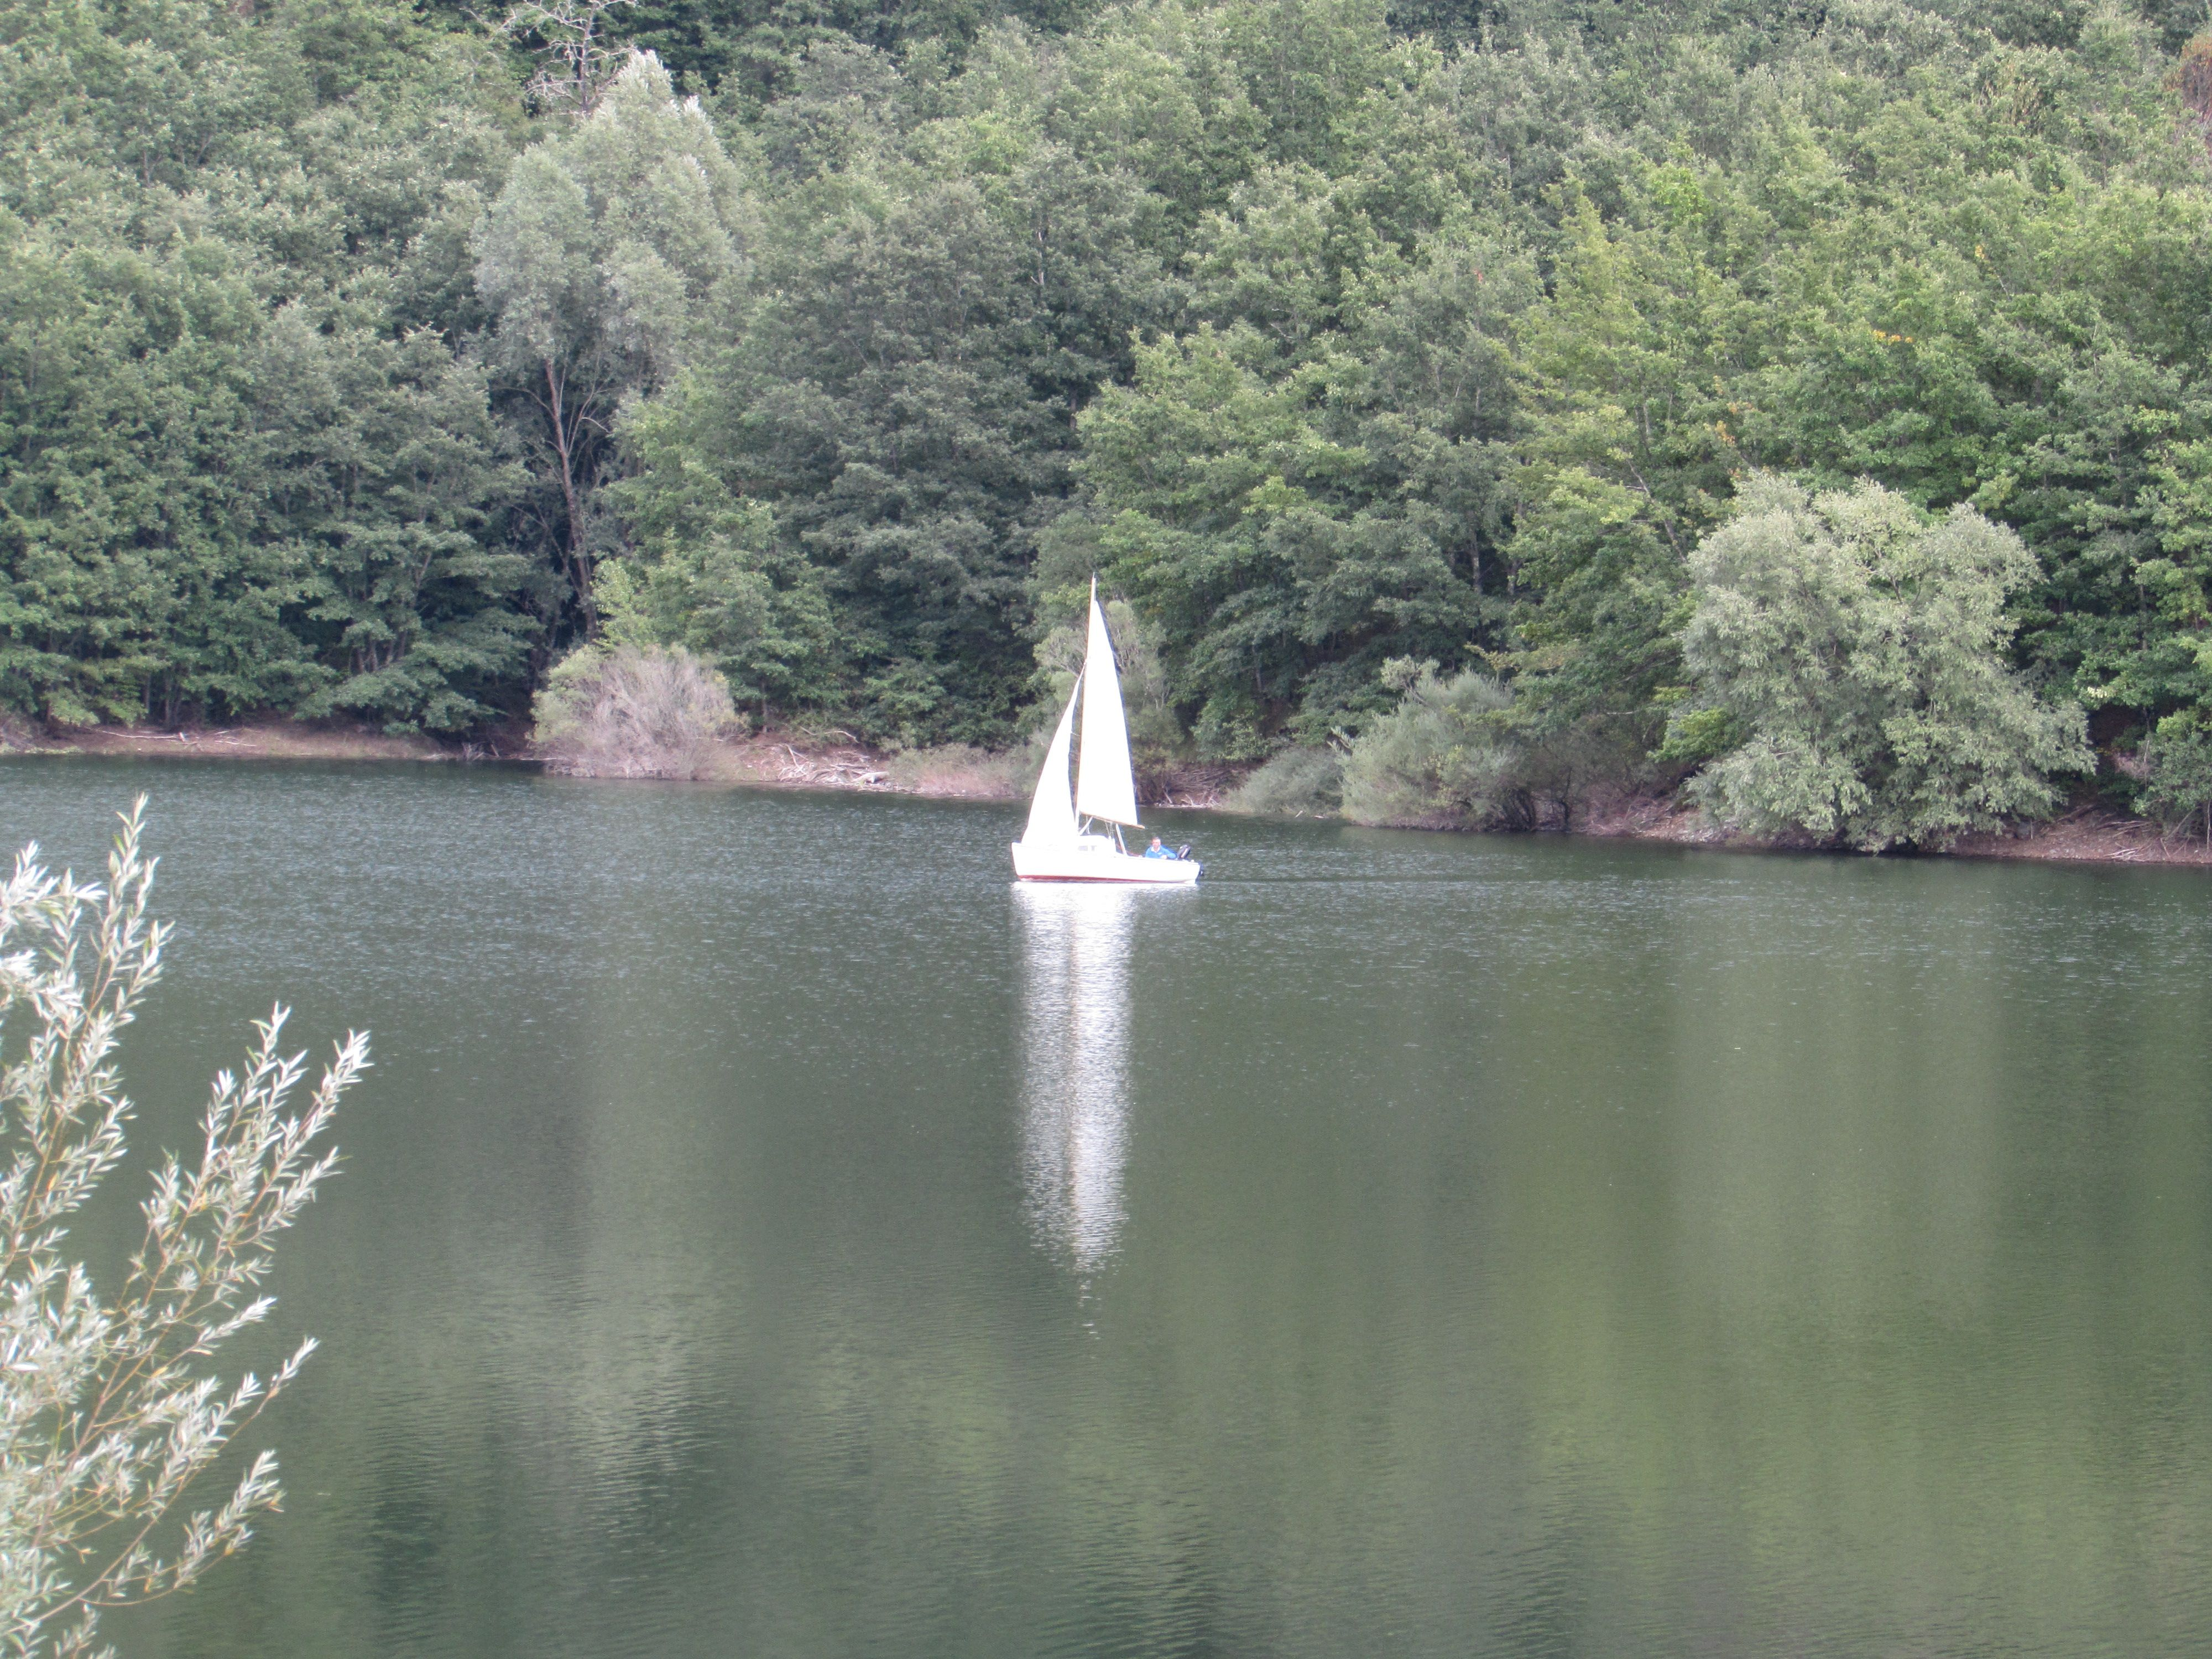 Lago di gramolazzo Garfagnana